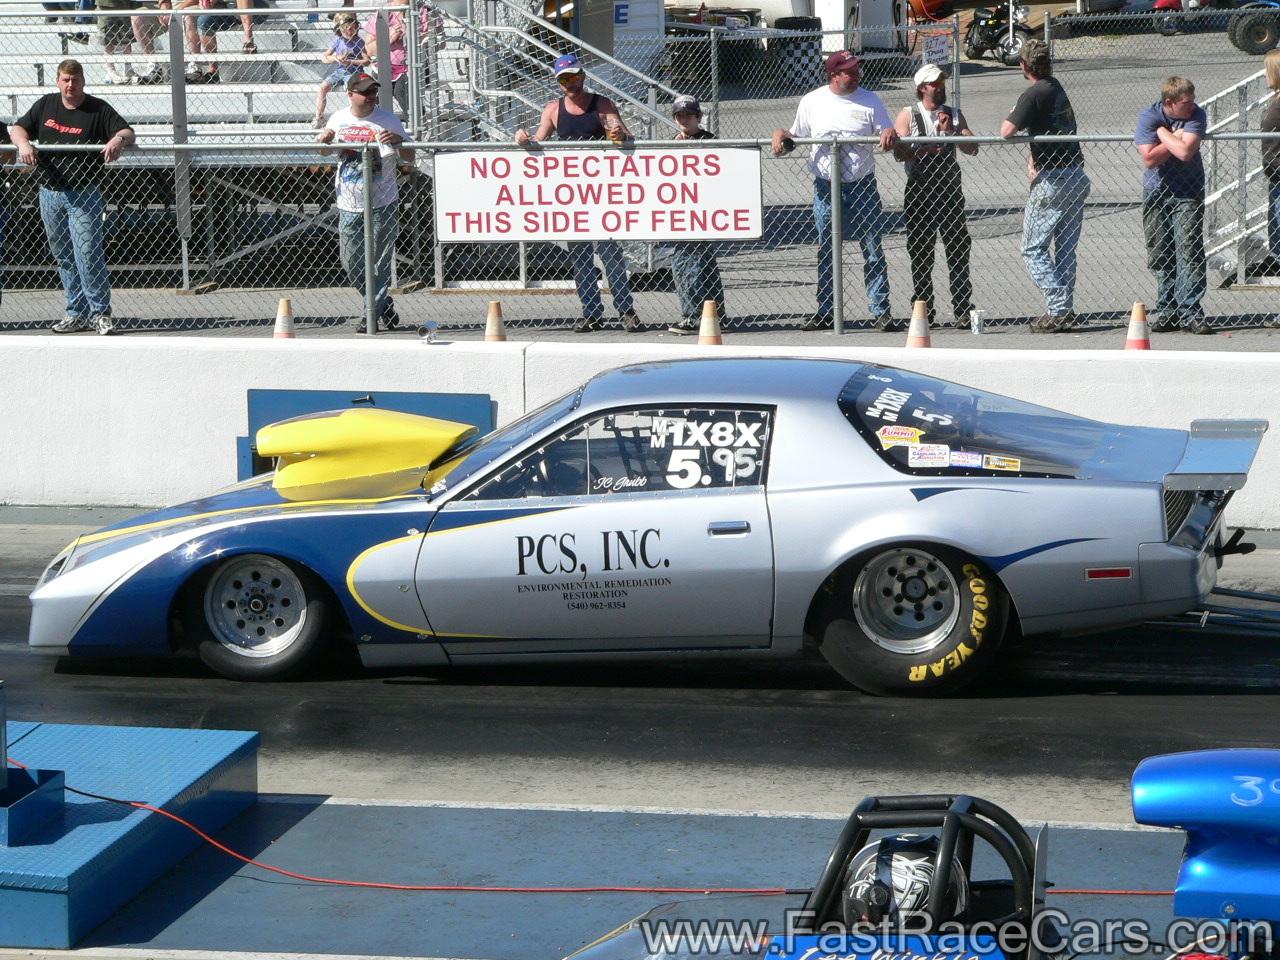 Drag Race Cars > Firebirds > Picture of SILVER PONTIAC Firebird Drag Car